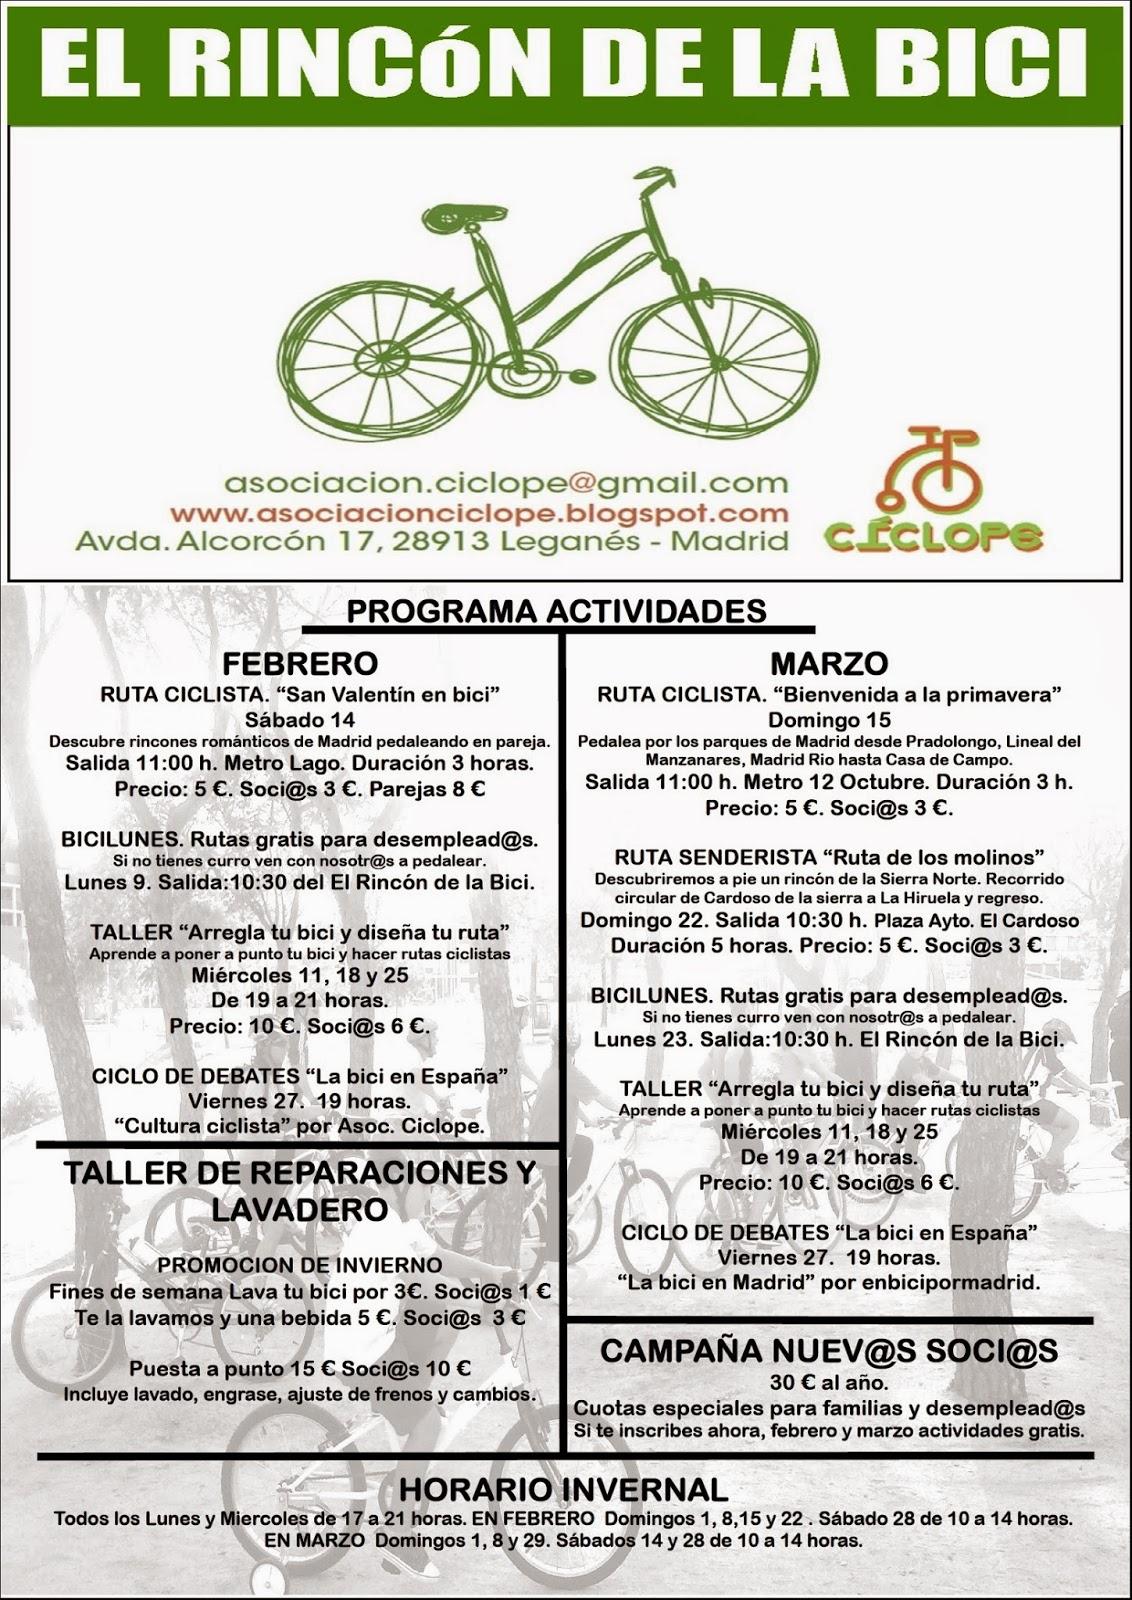 http://asociacionciclope.blogspot.com.es/2015/01/programa-de-actividades-febrero-marzo.html